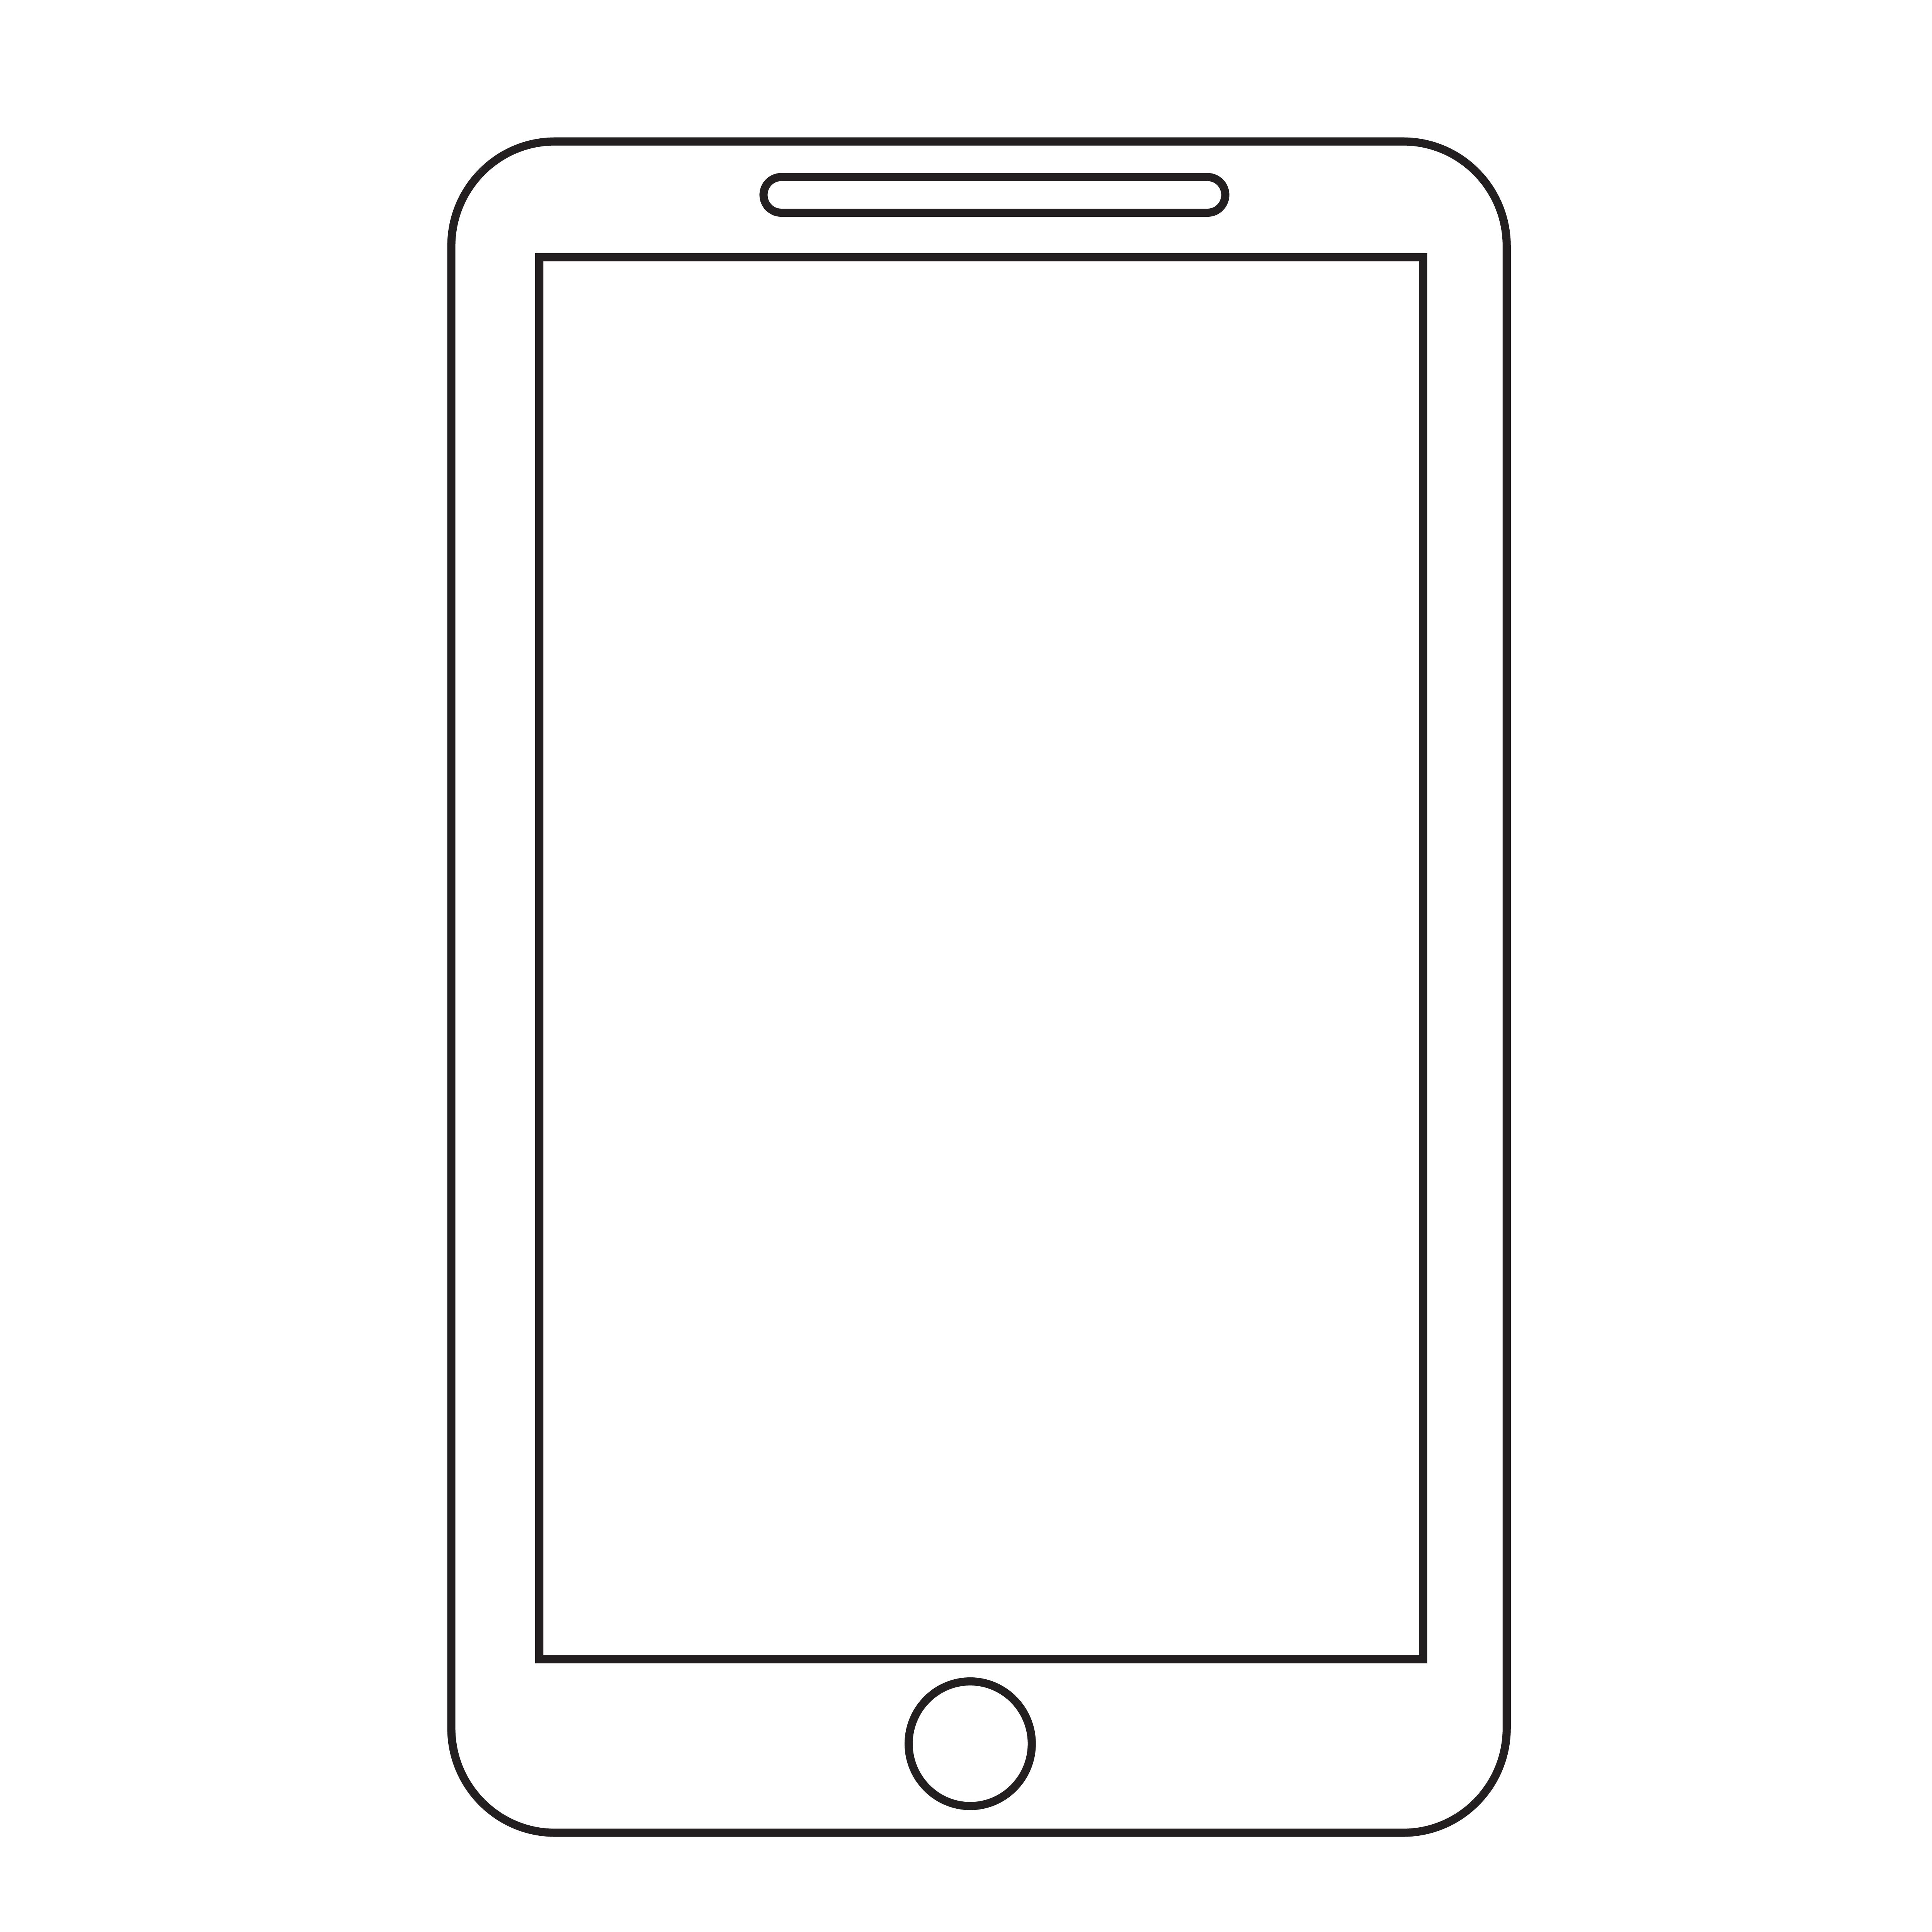 smartphone icon symbol sign - Download Free Vectors ...